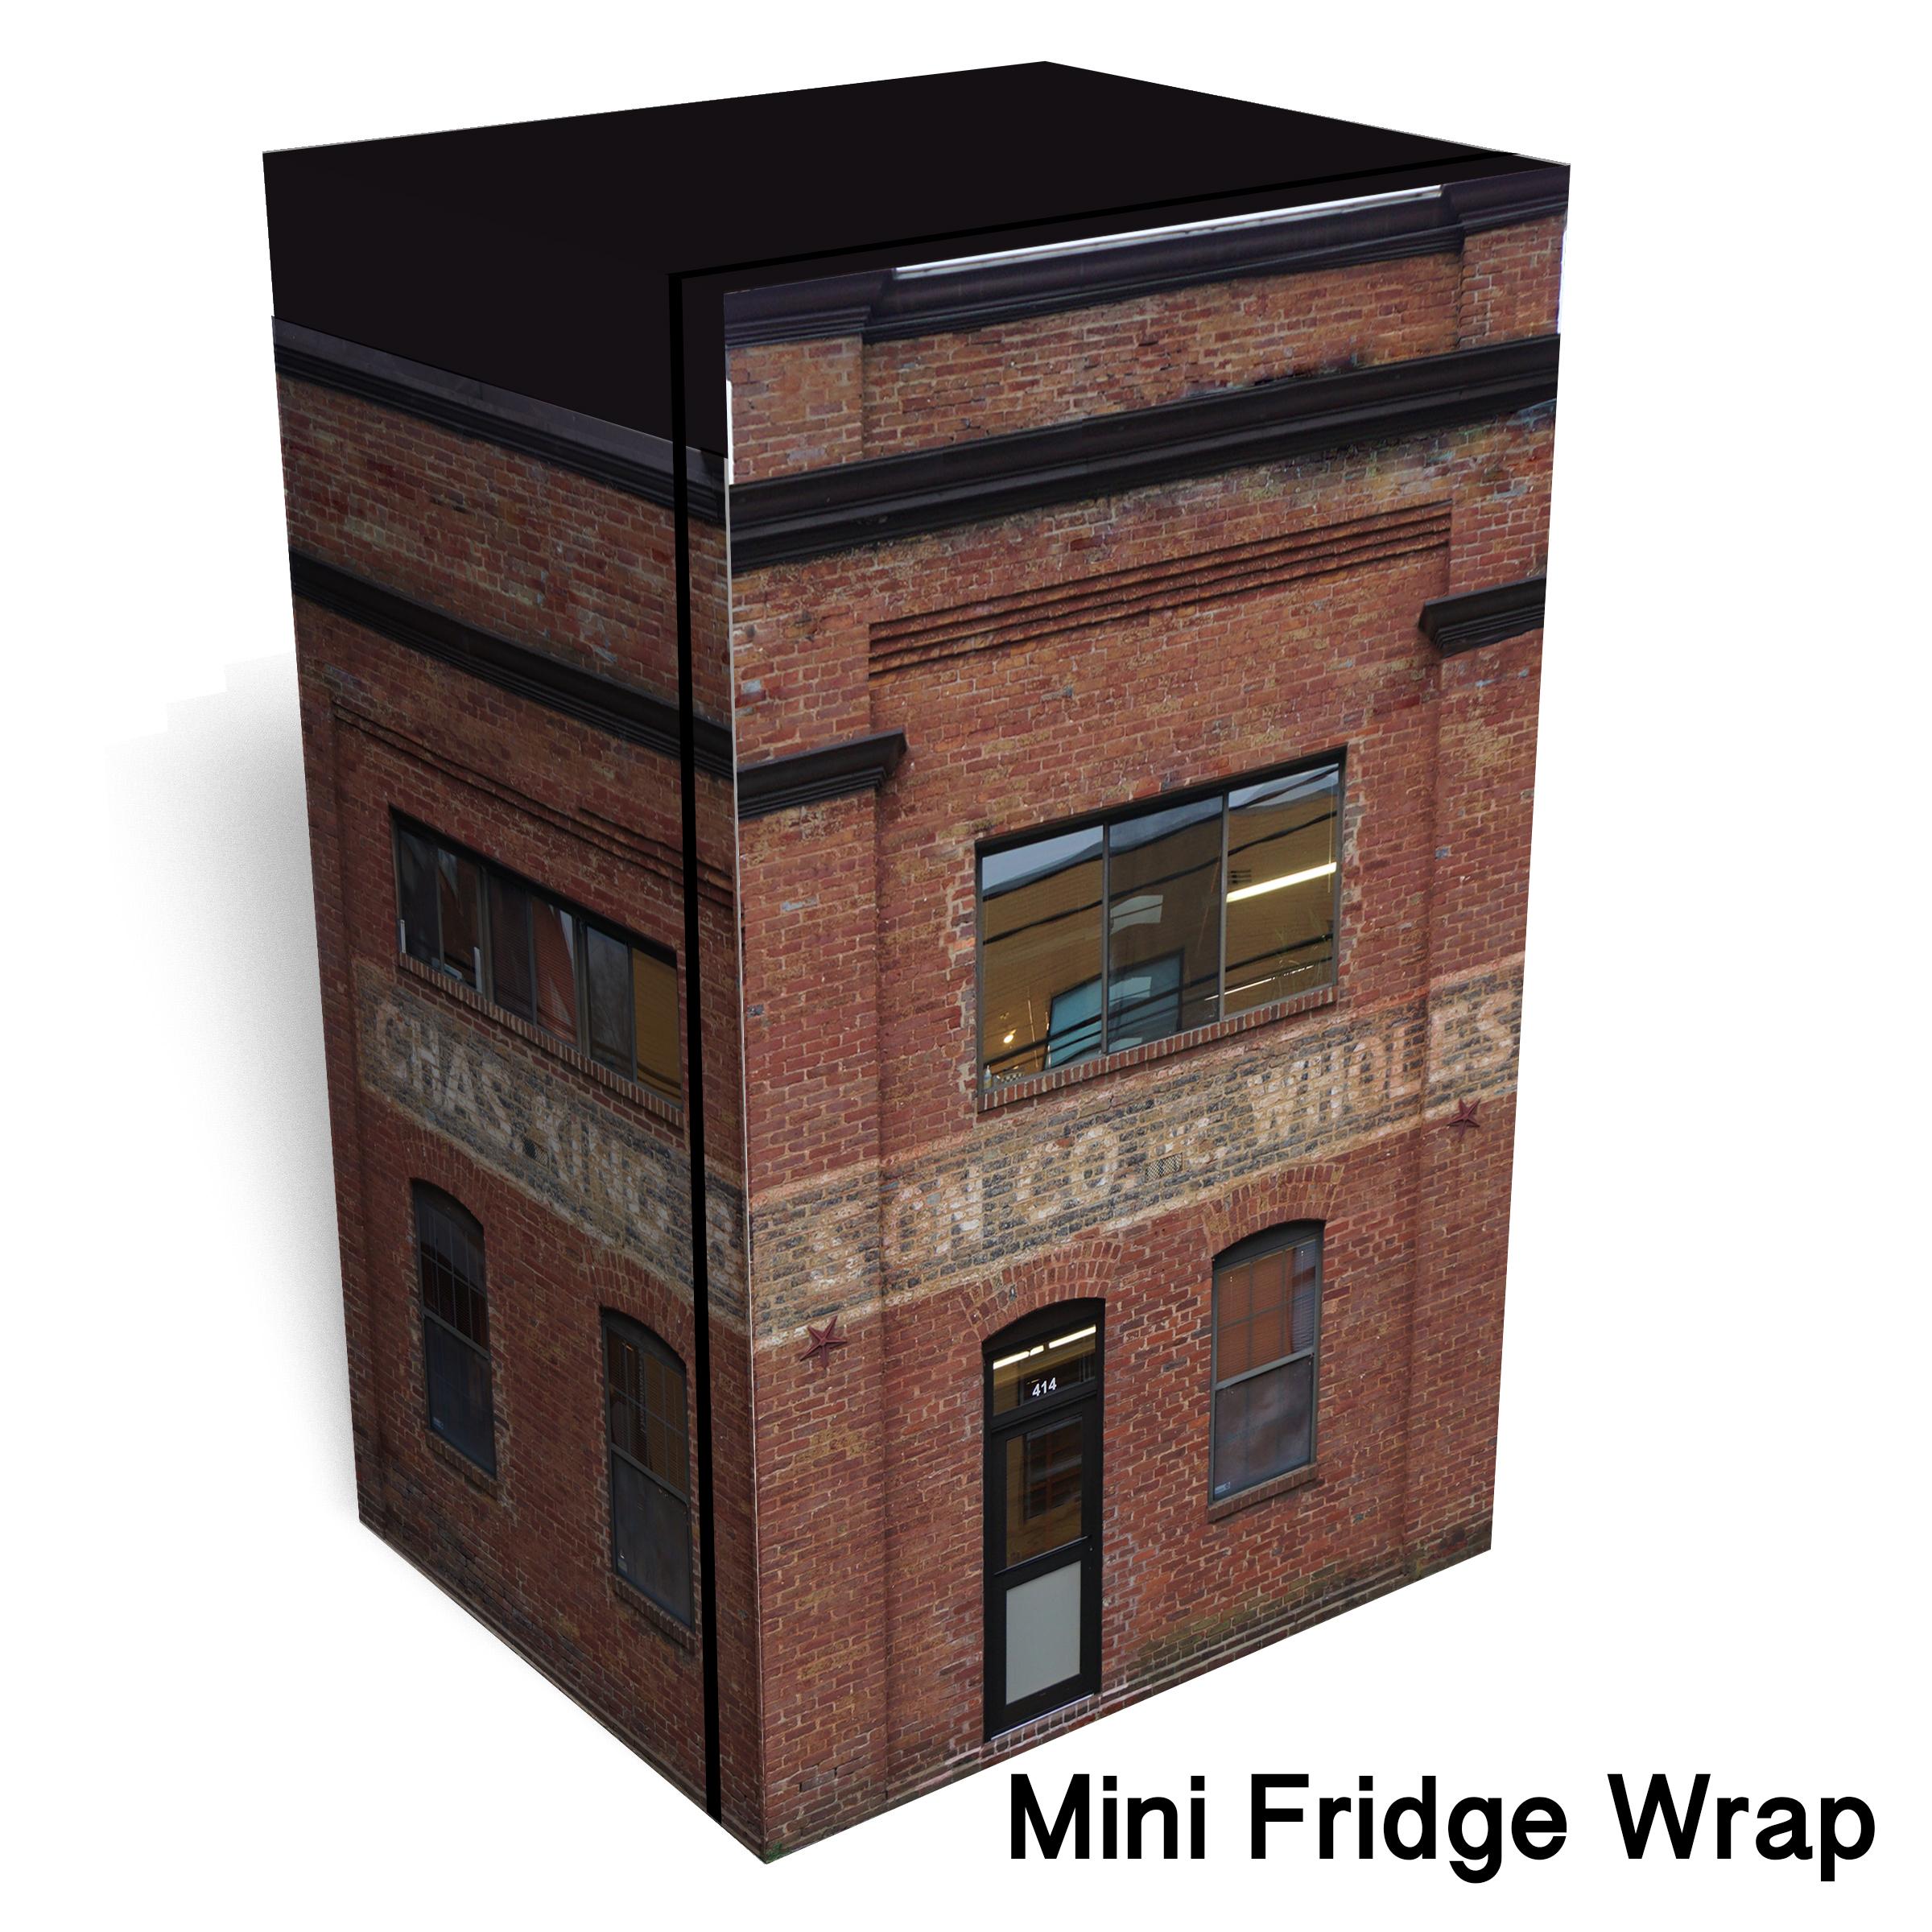 Whole Sale Building Mini Fridge Wrap